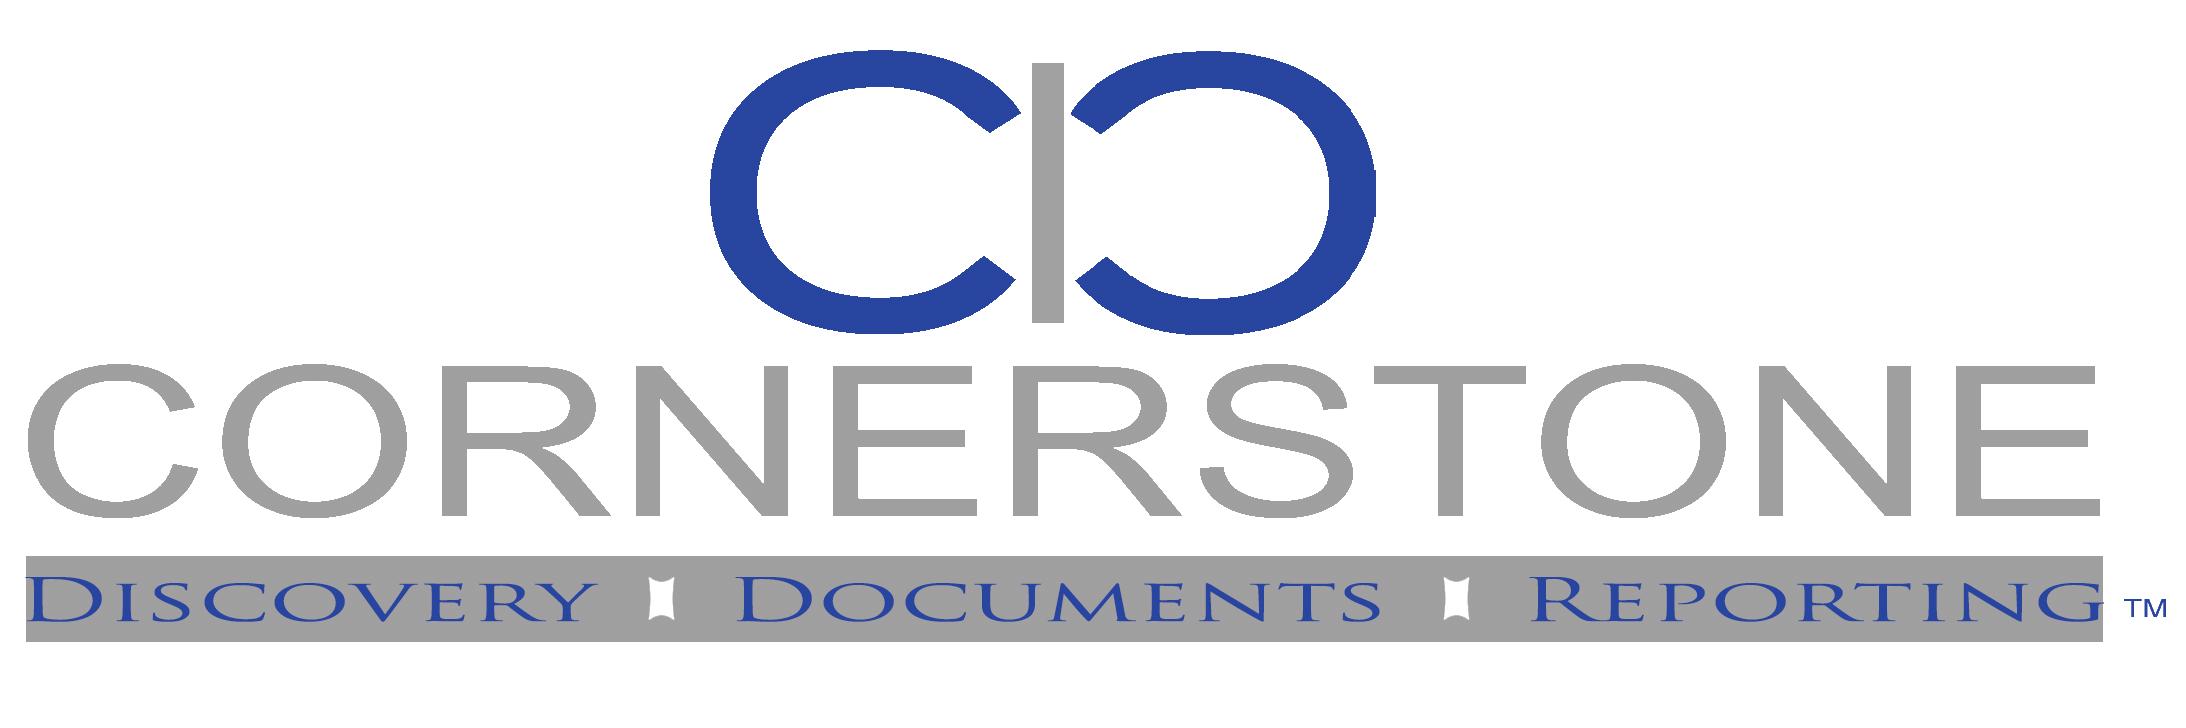 Cornerstone LogoTransparent.png